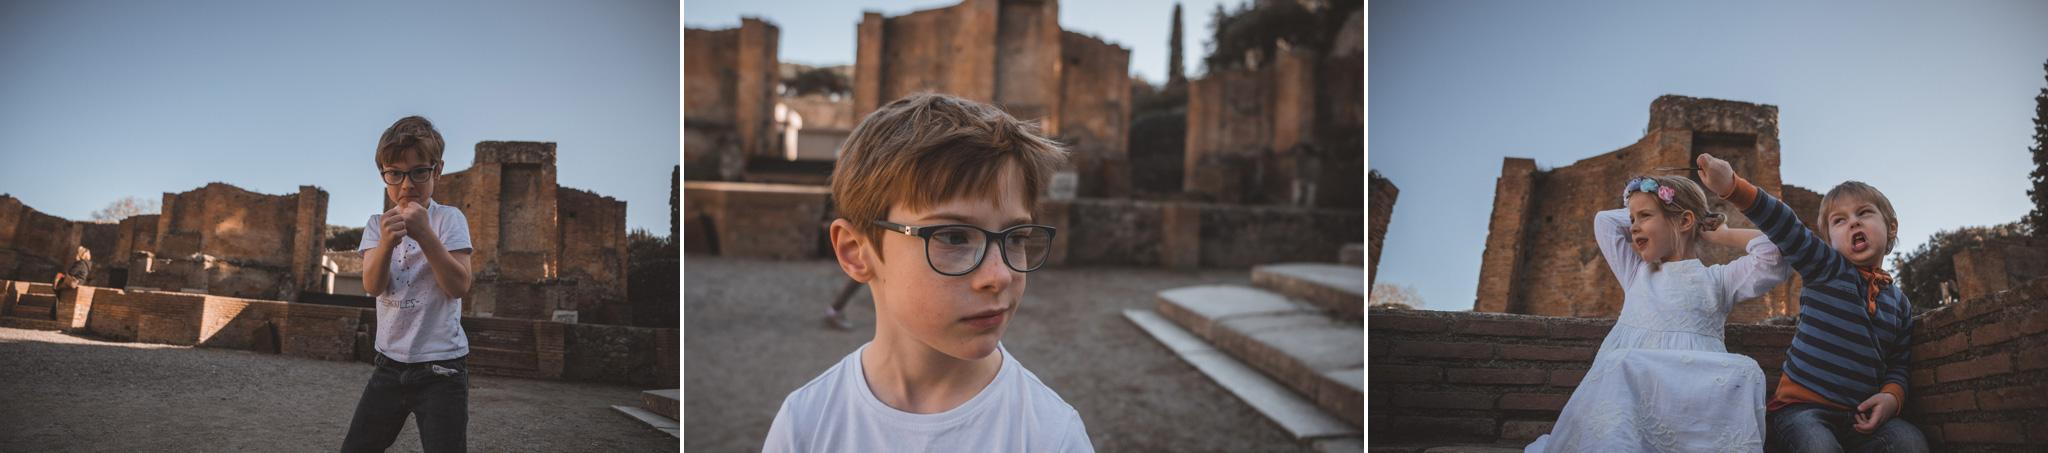 027-wedding-photographer-in-pompeii.jpg